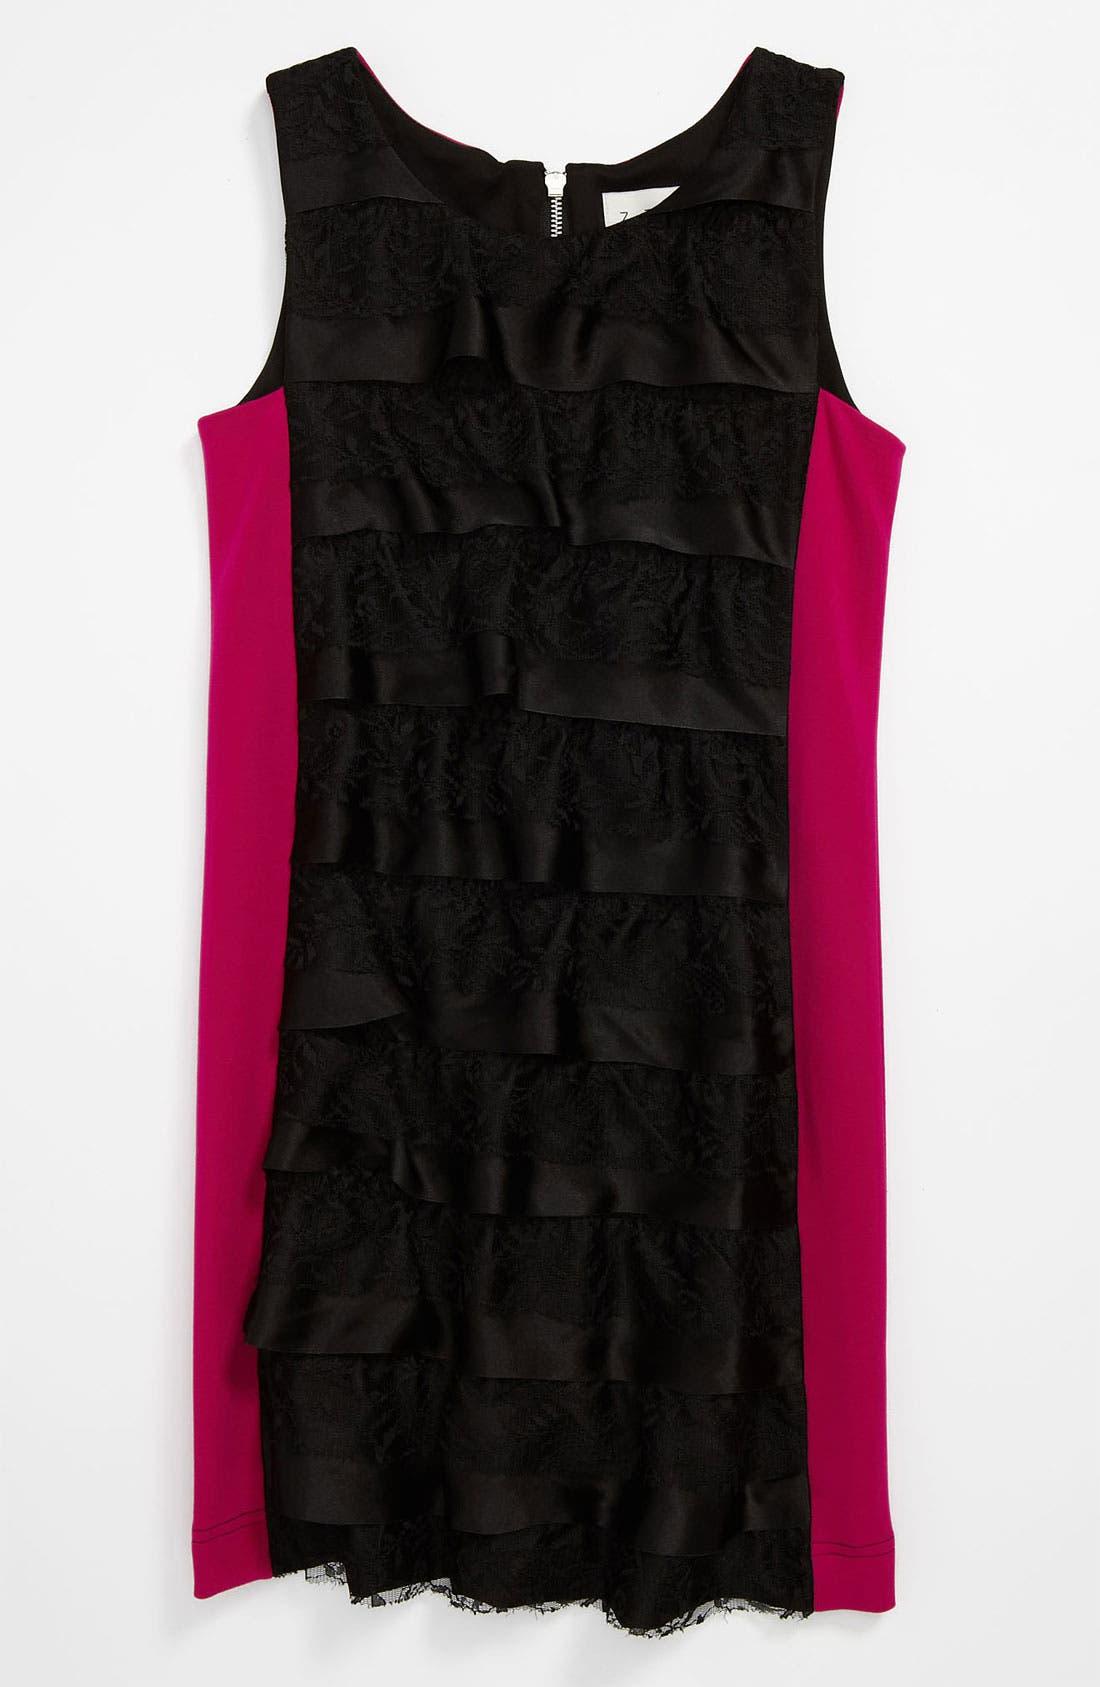 Alternate Image 1 Selected - Z by Zoe Ruffle Dress (Big Girls)